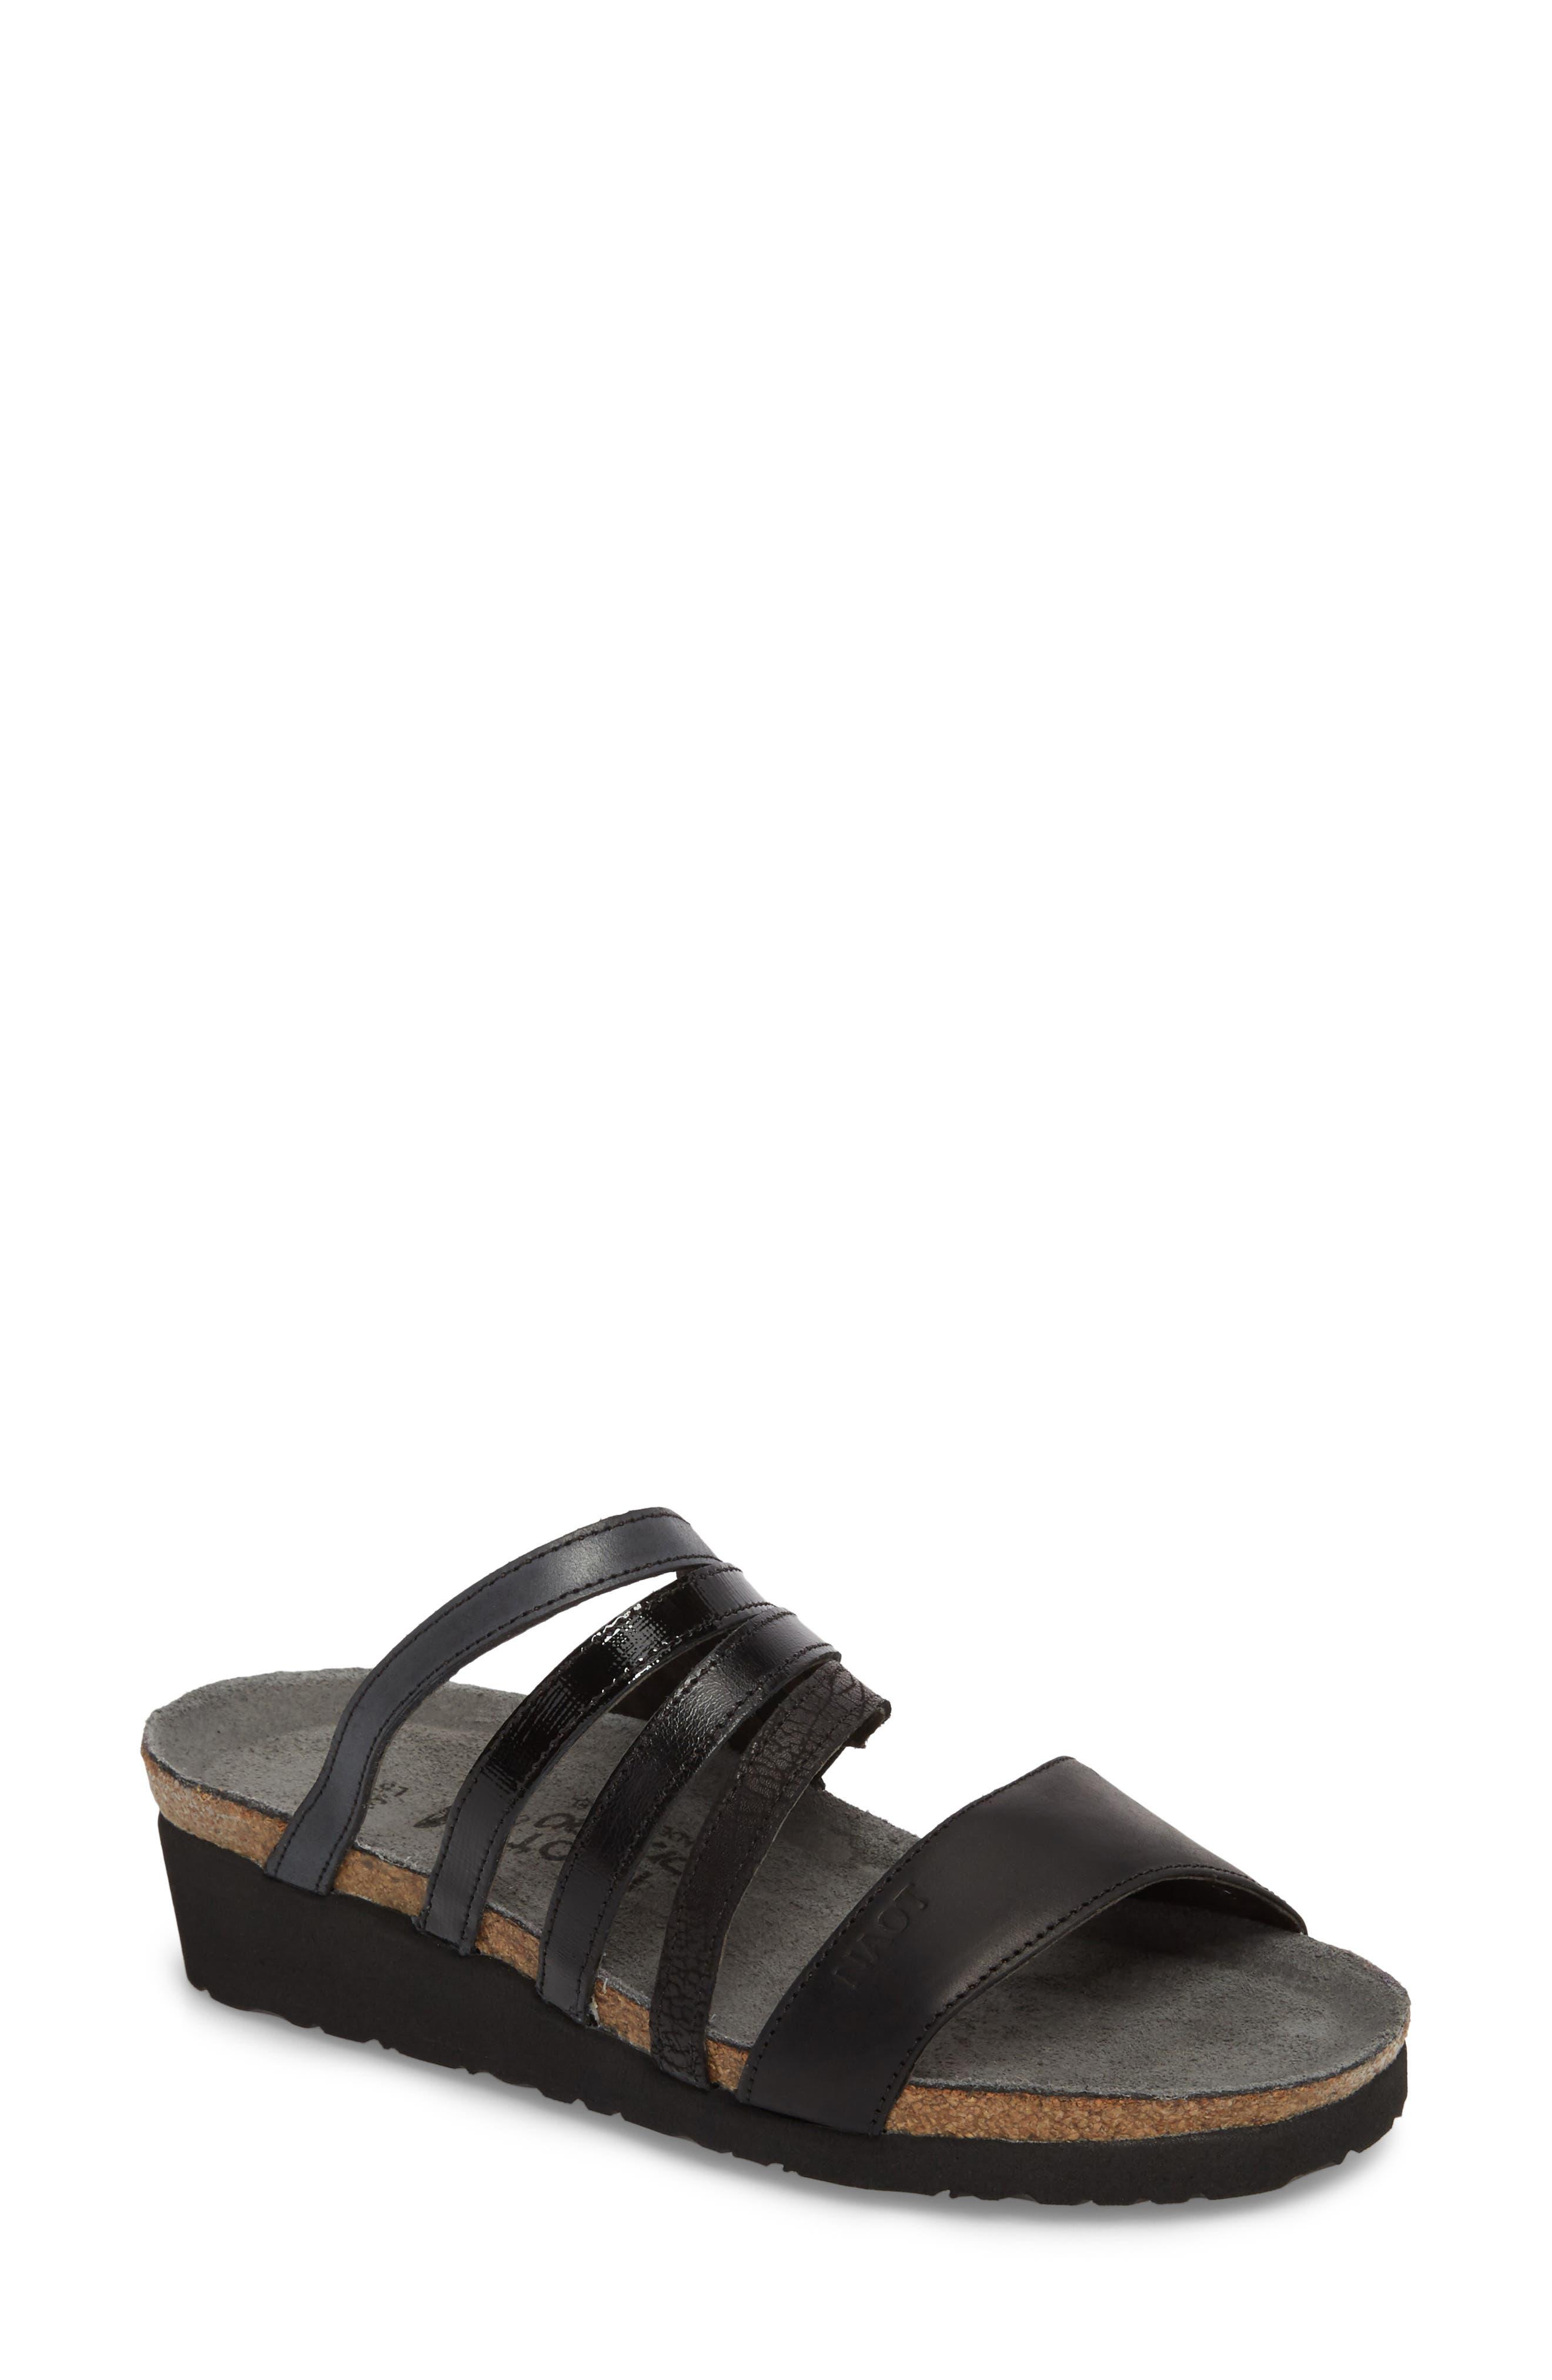 Peyton Slide Sandal,                         Main,                         color, OILY COAL NUBUCK